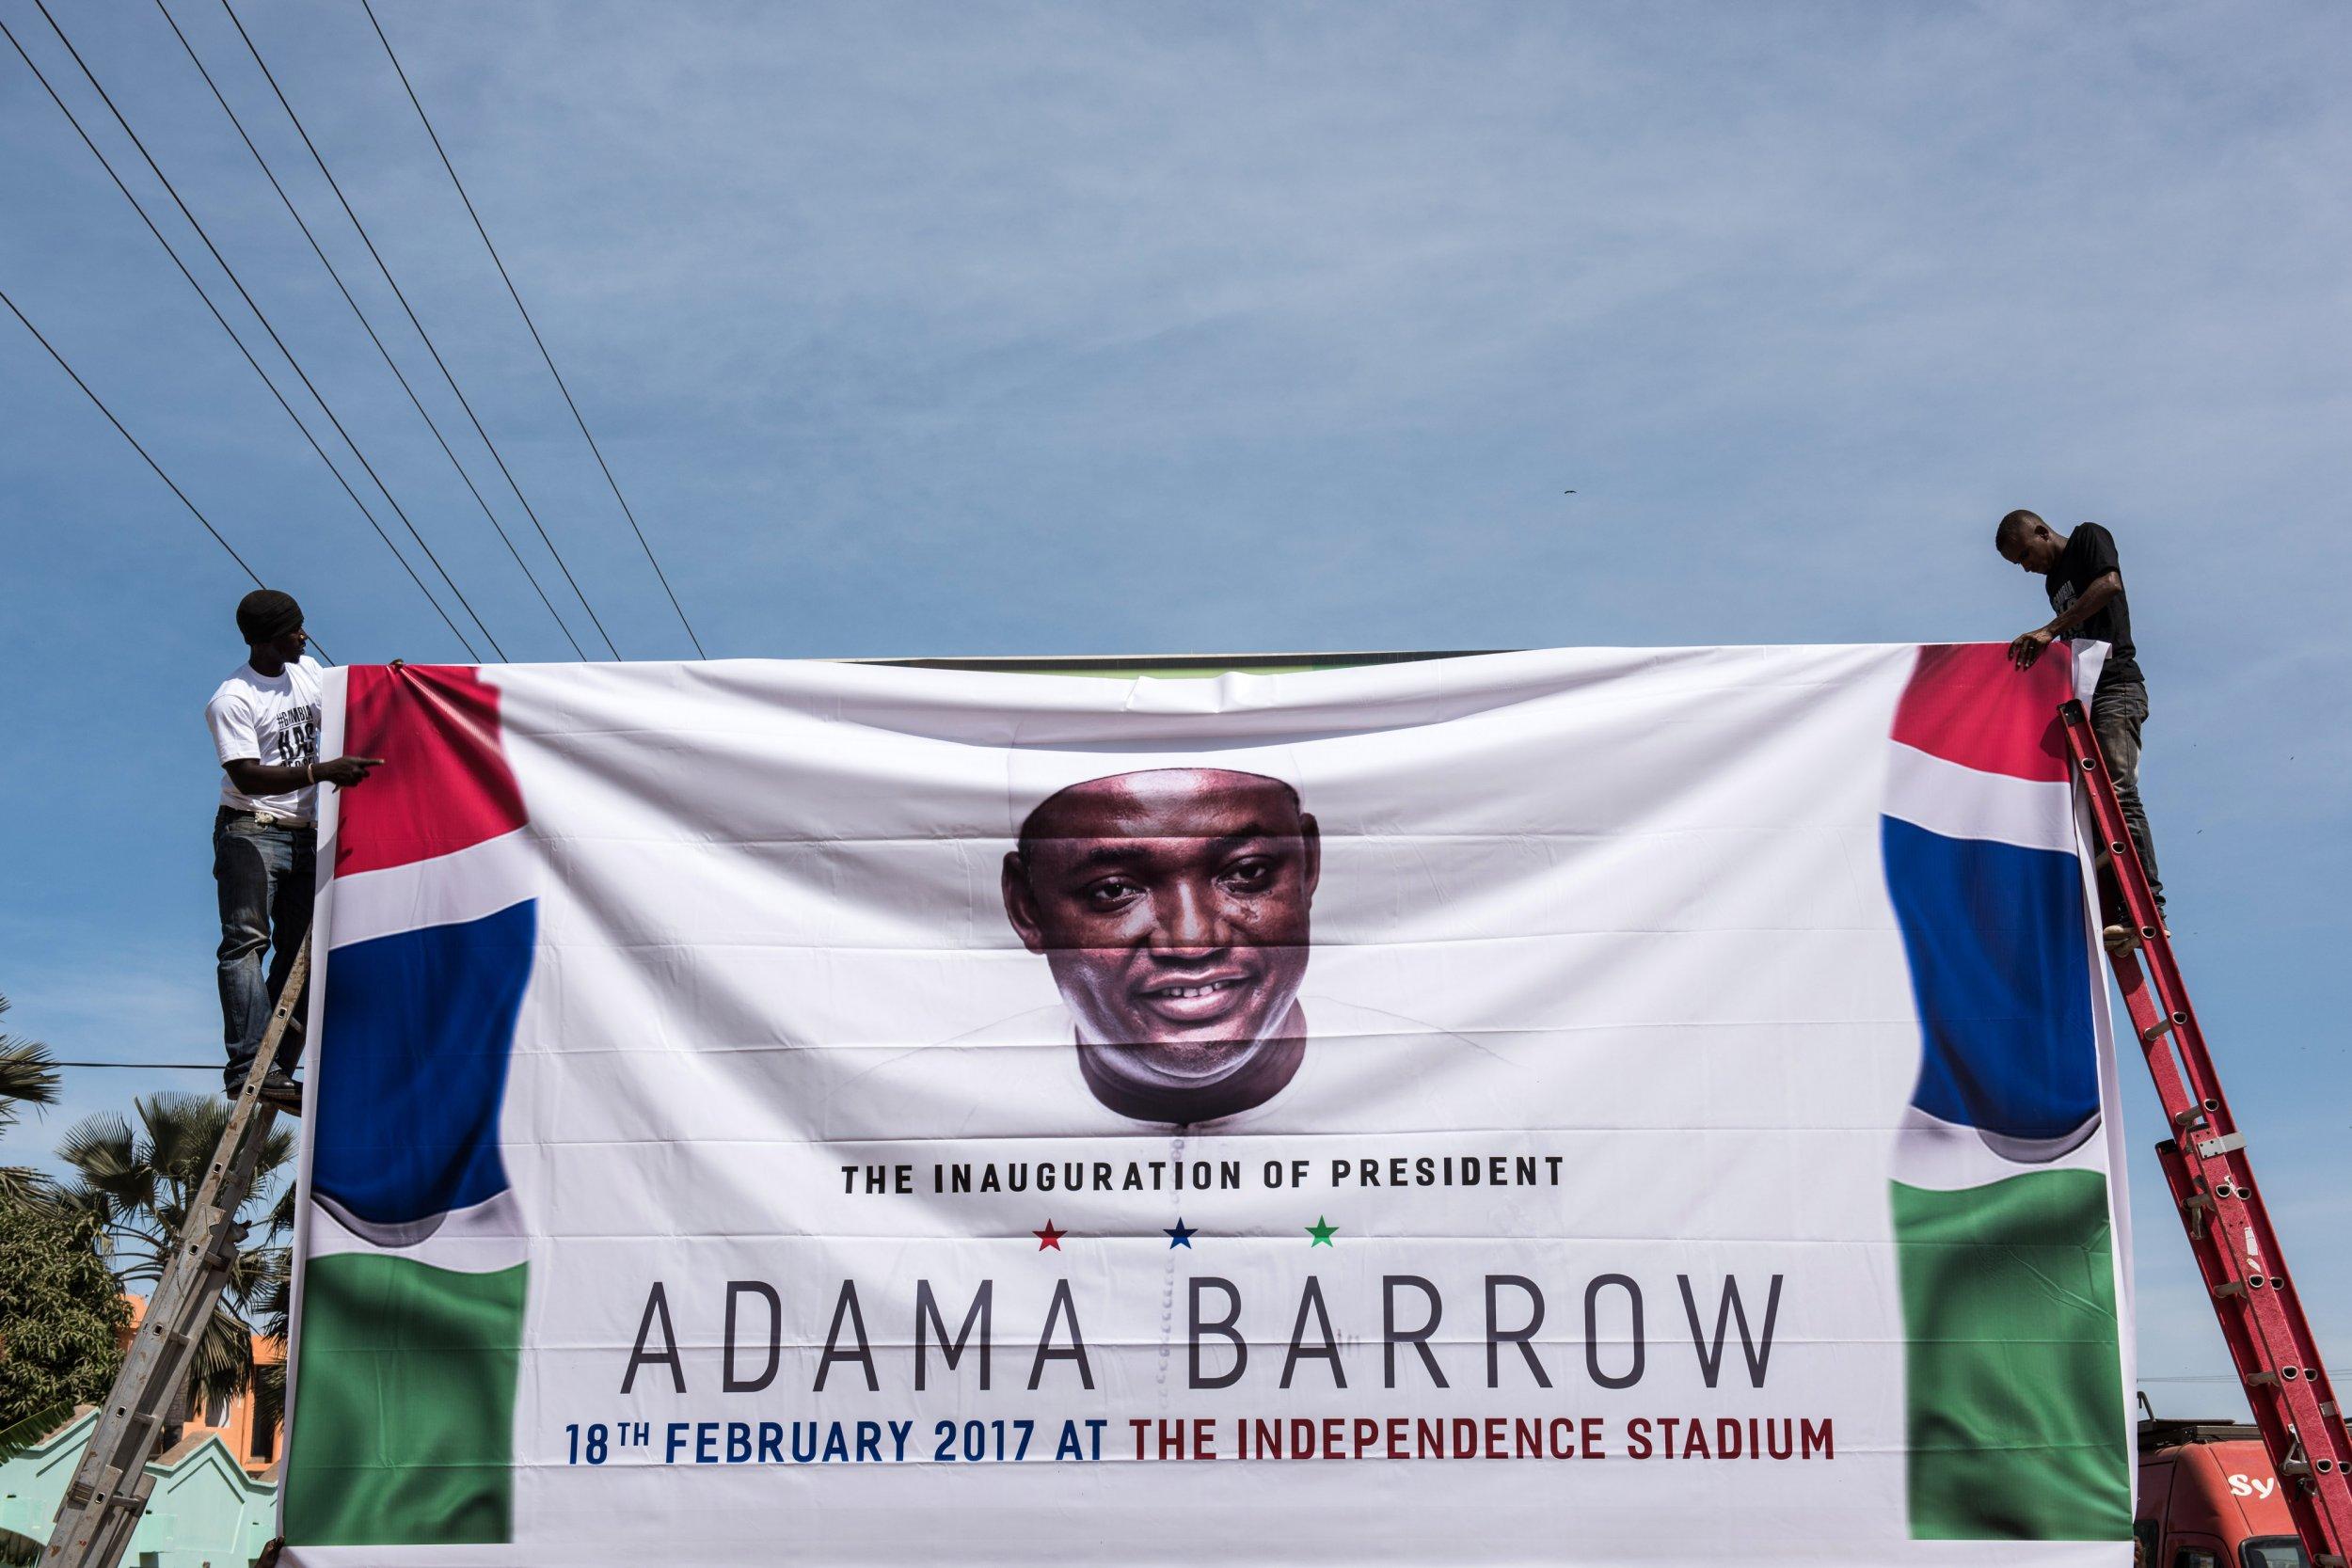 Adama Barrow banner